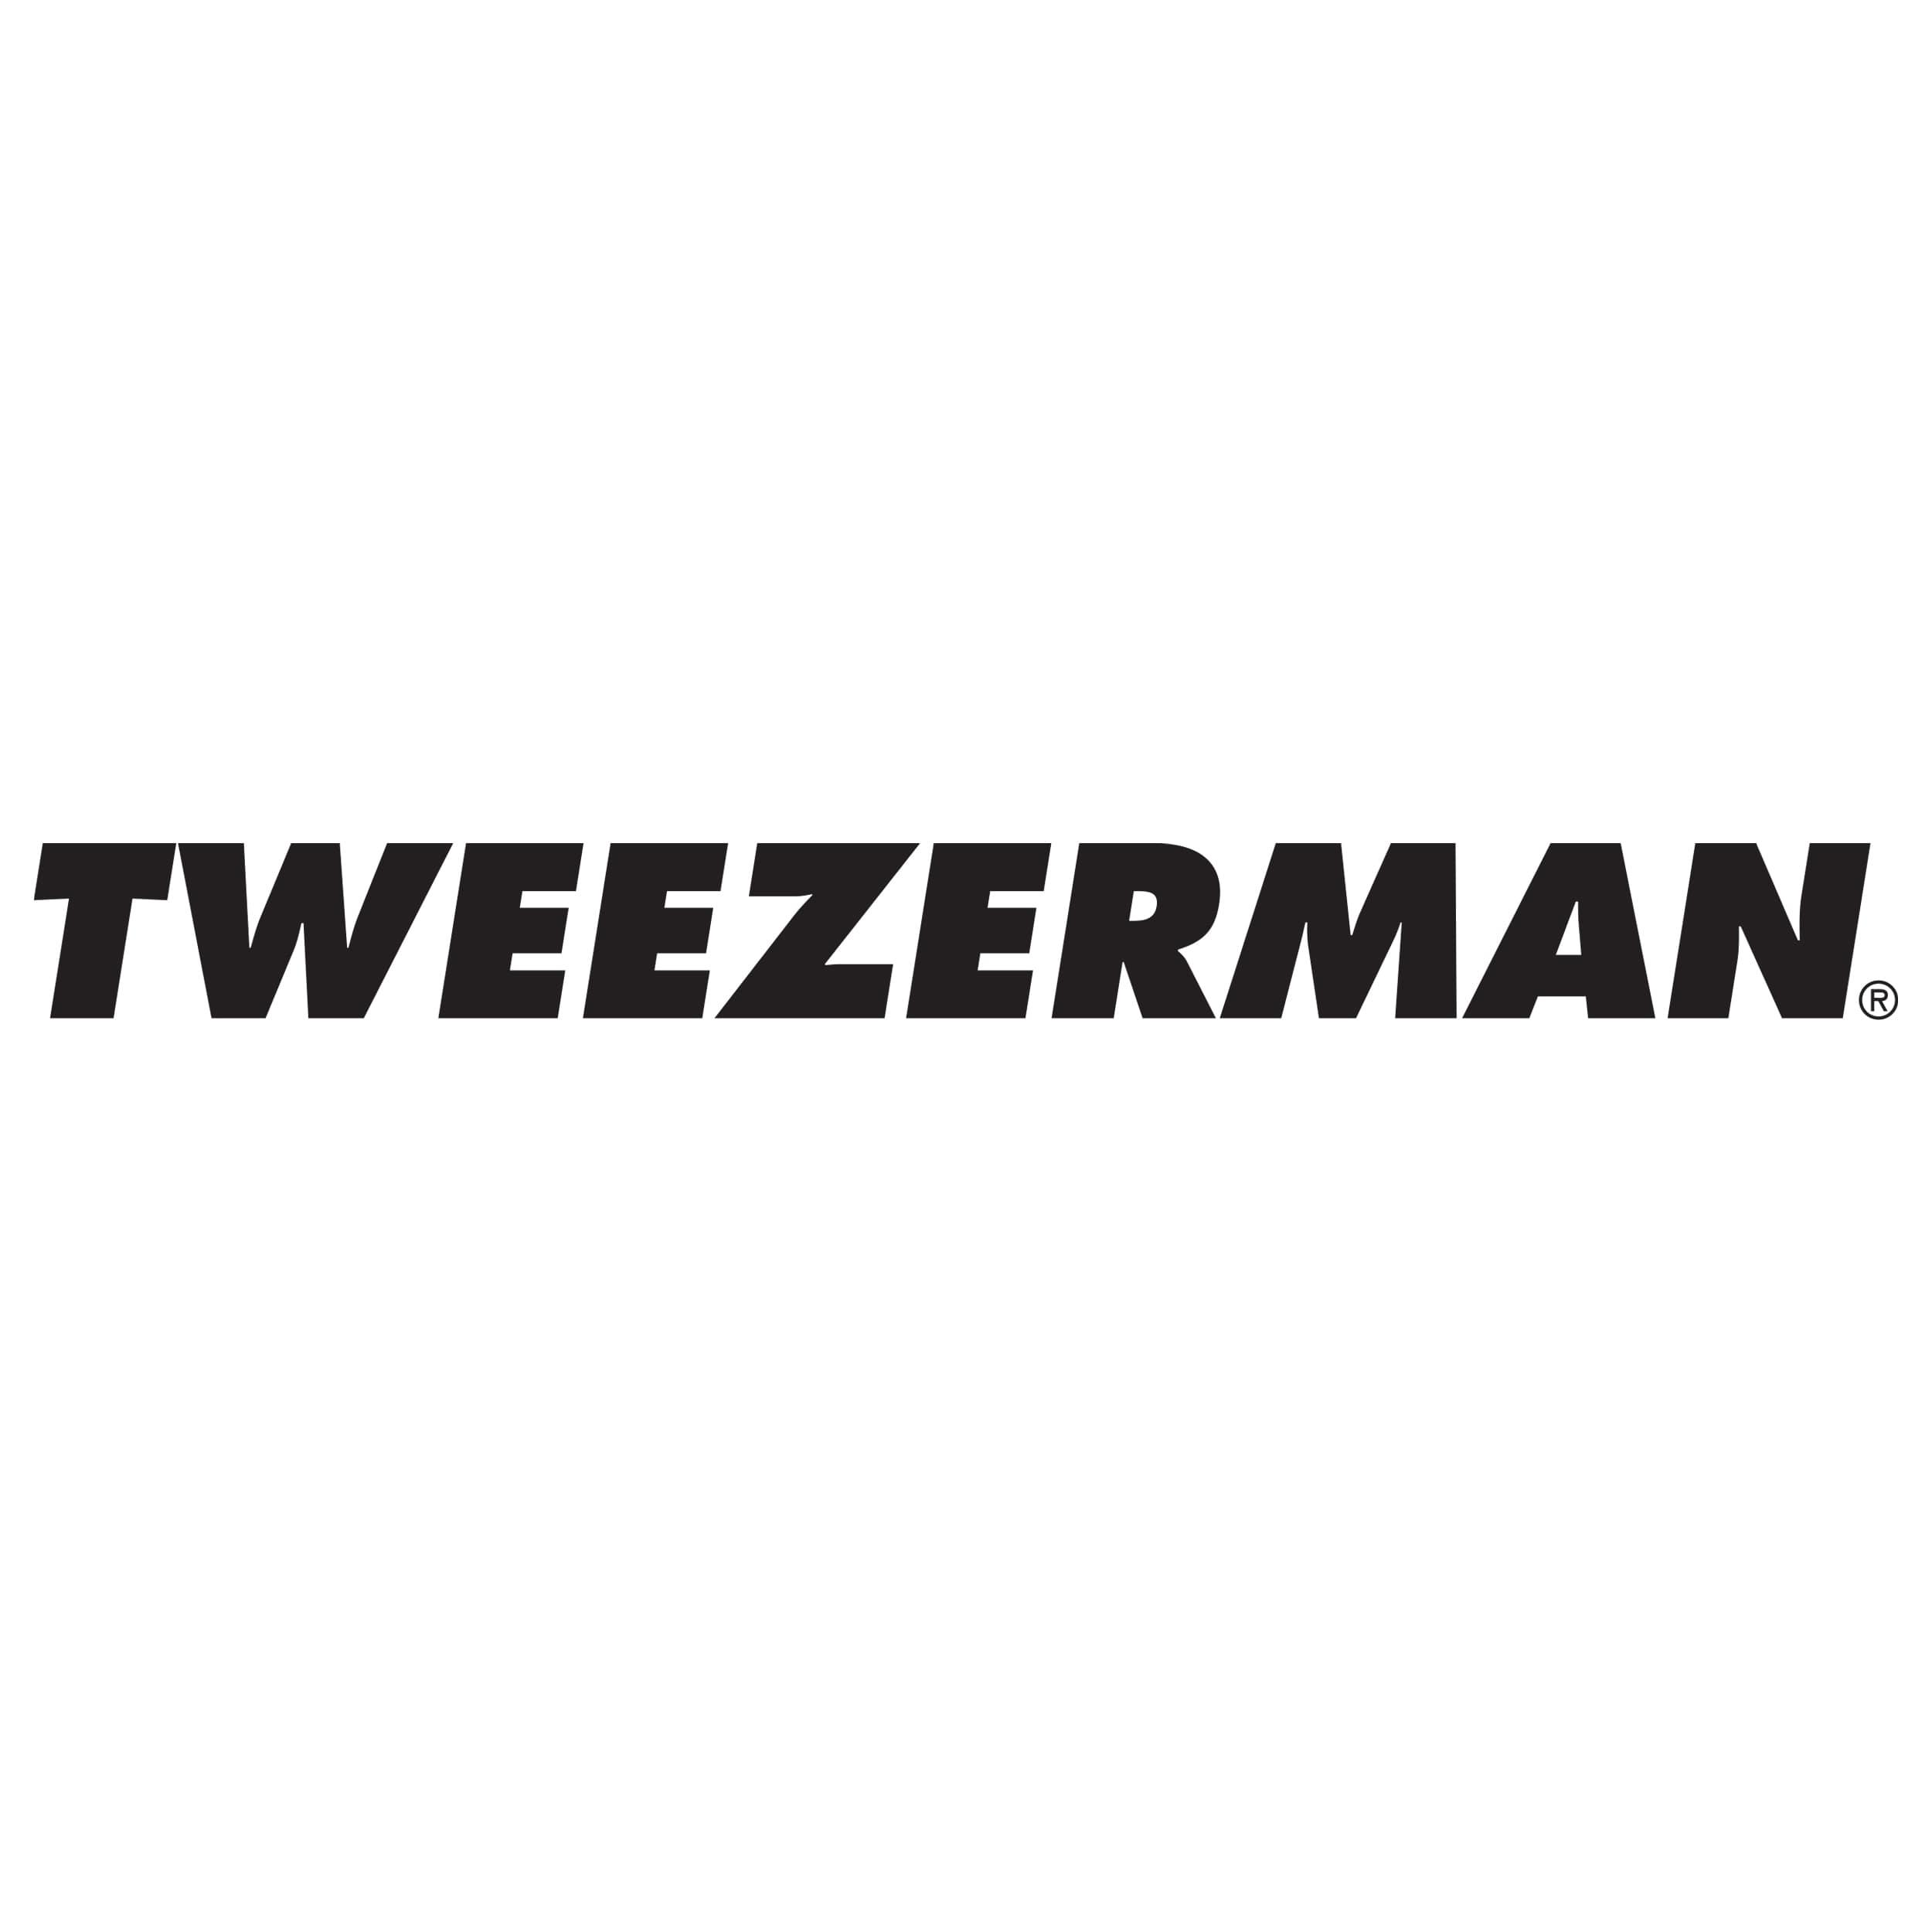 Tweezermate 10x Lighted Magnifying Mirror Face Tweezerman